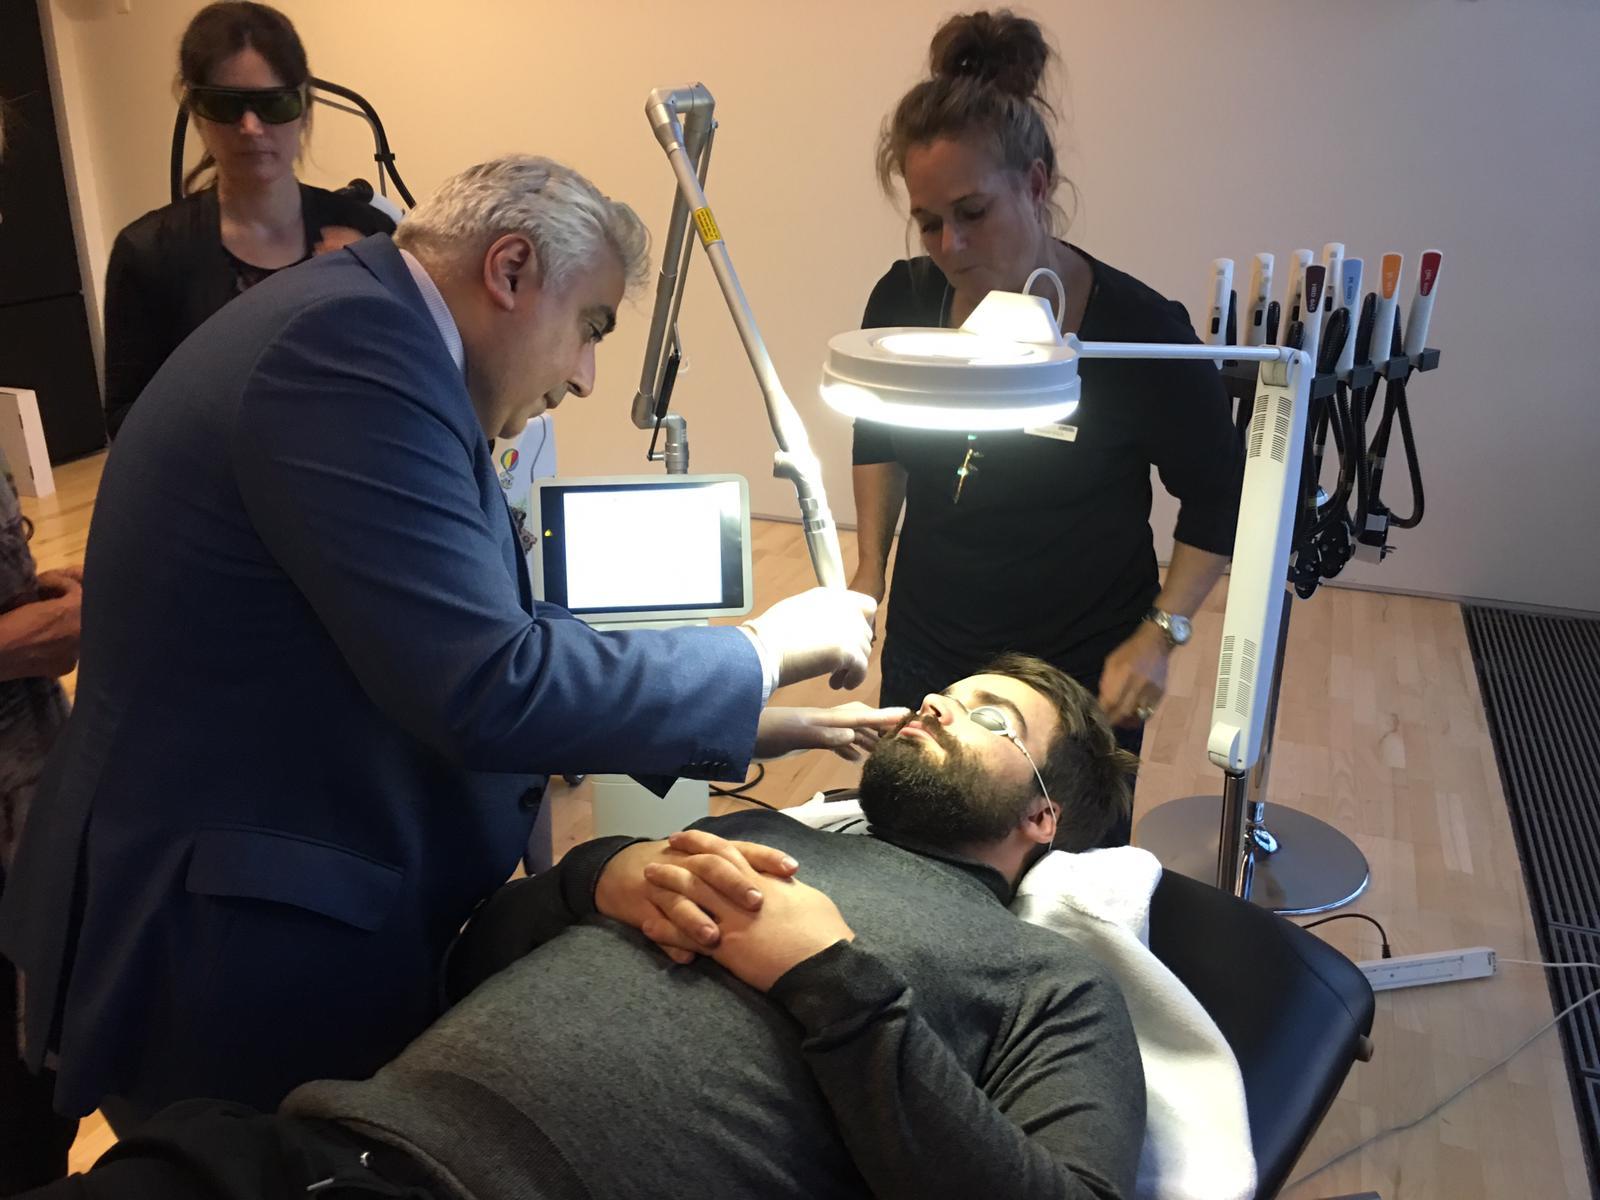 Professional London Dermatologist